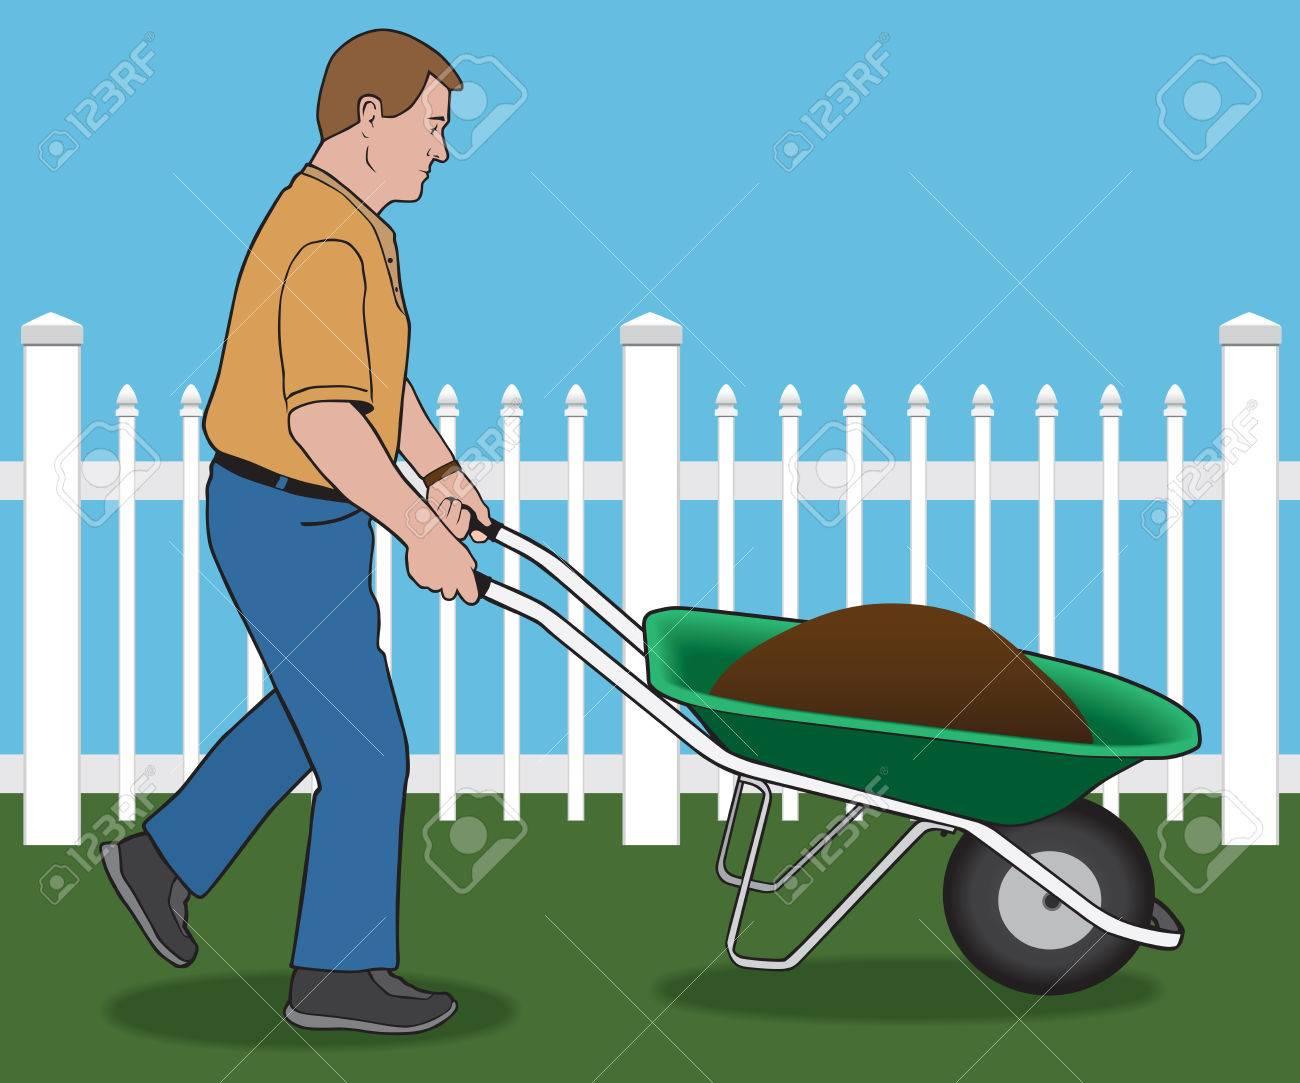 Man pushing wheelbarrow load of dirt through yard - 40205877